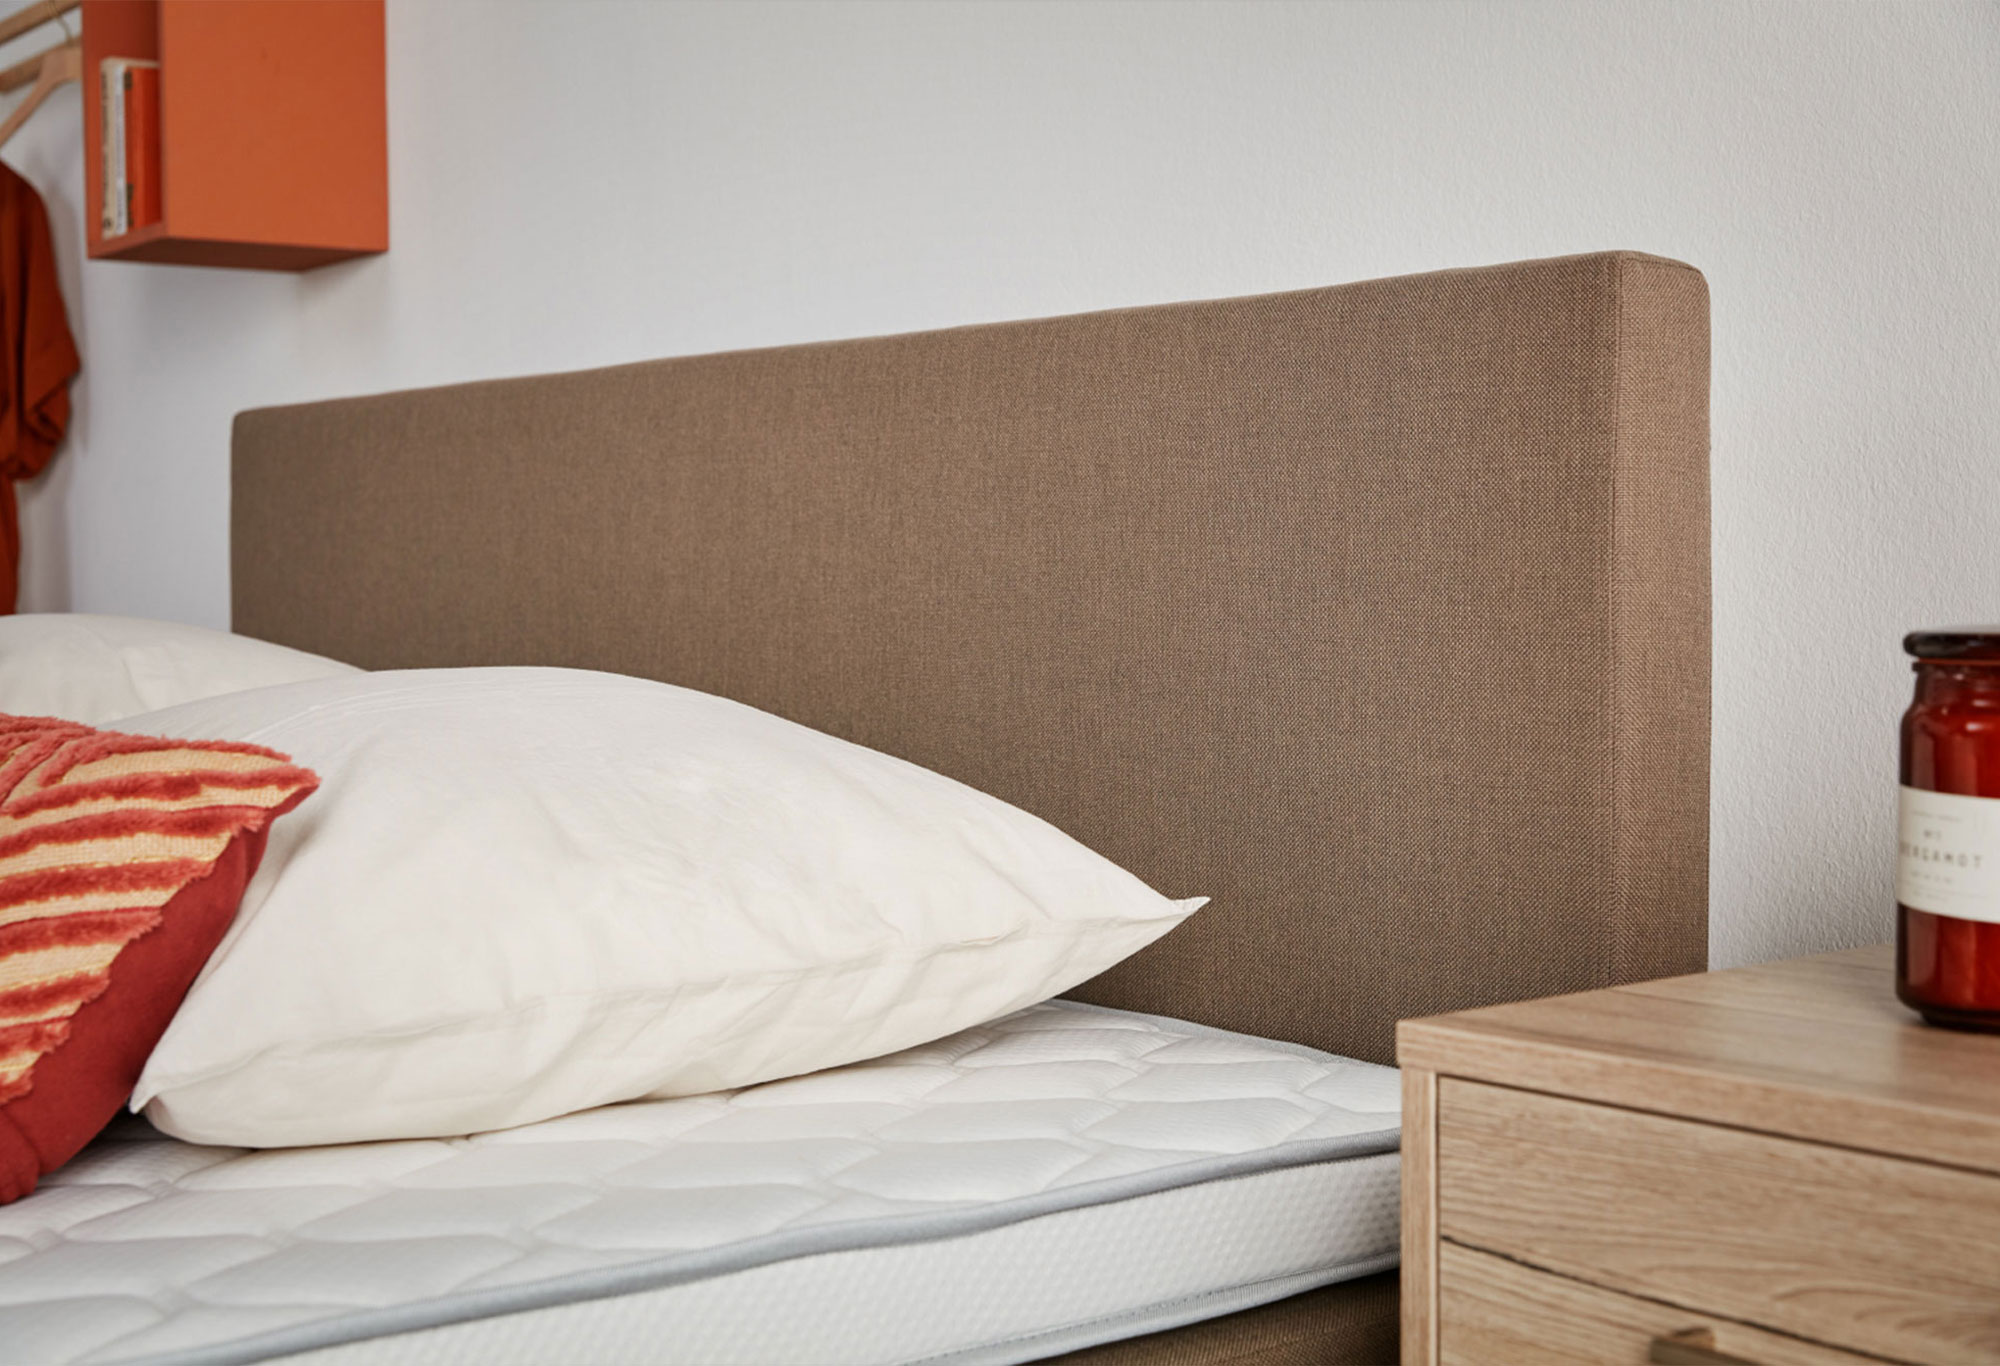 Boxspringbett Web-Only Rest Deluxe   Swiss Sense